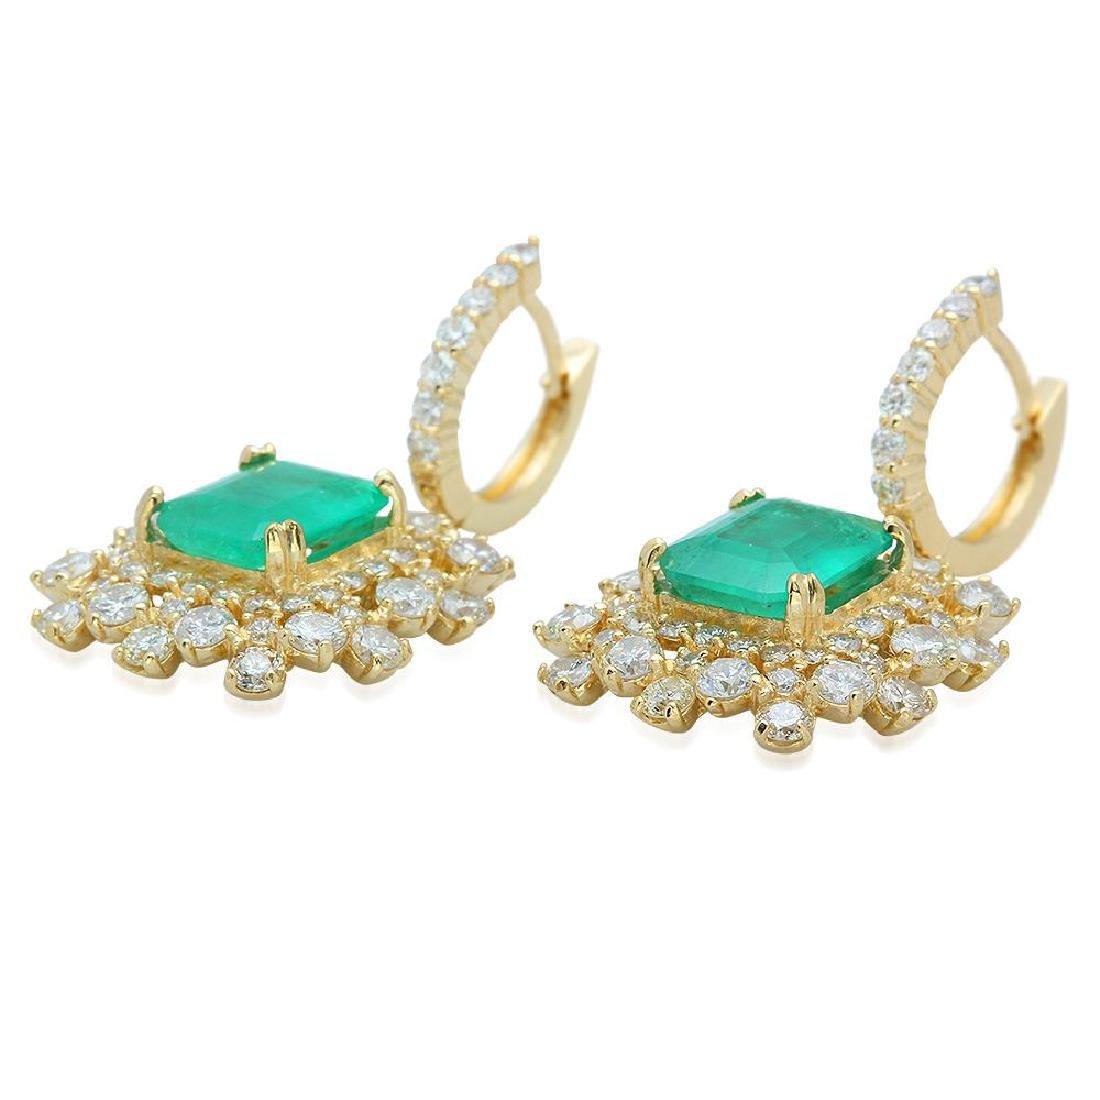 14K Gold 6.28ct Emerald 5.84ct Diamond Earrings - 2